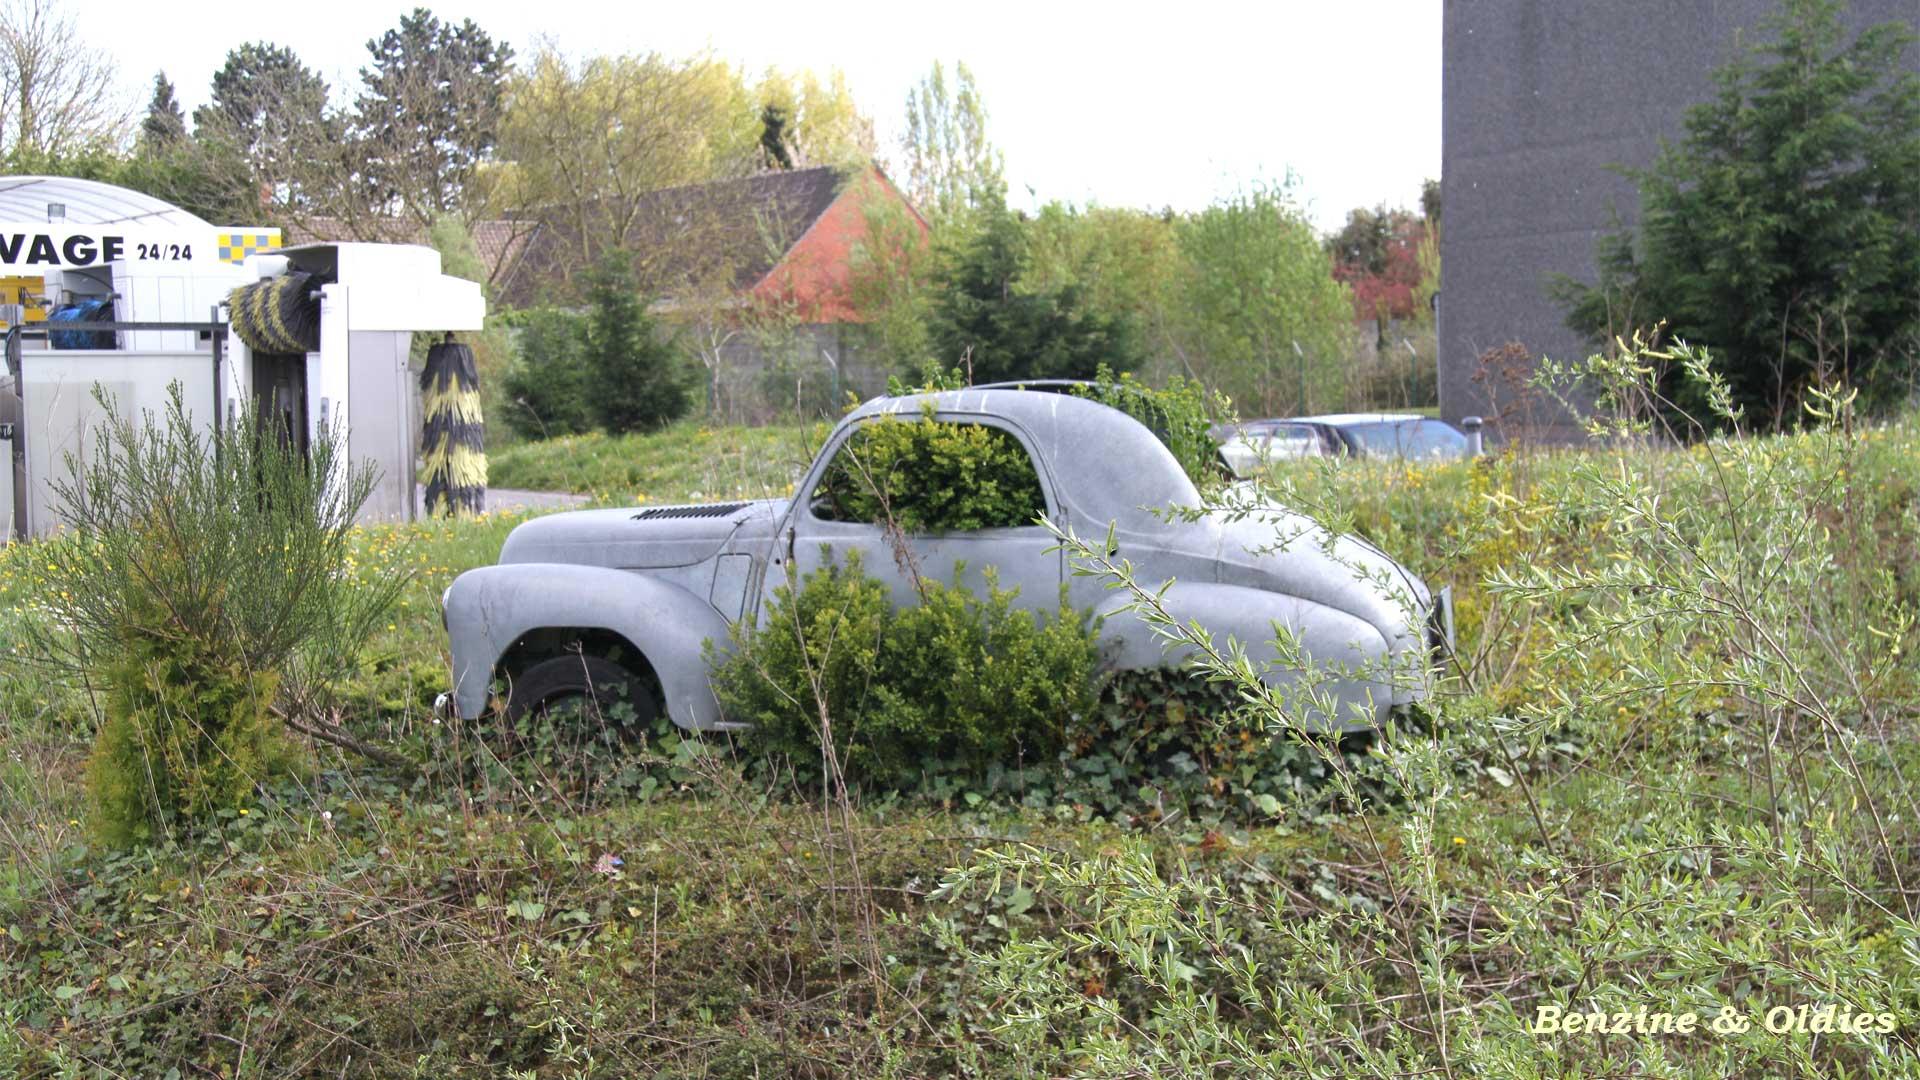 une Simca 6 carrosserie aluminium oubliée dans la nature - Simca6 951789simca6street14w19201080